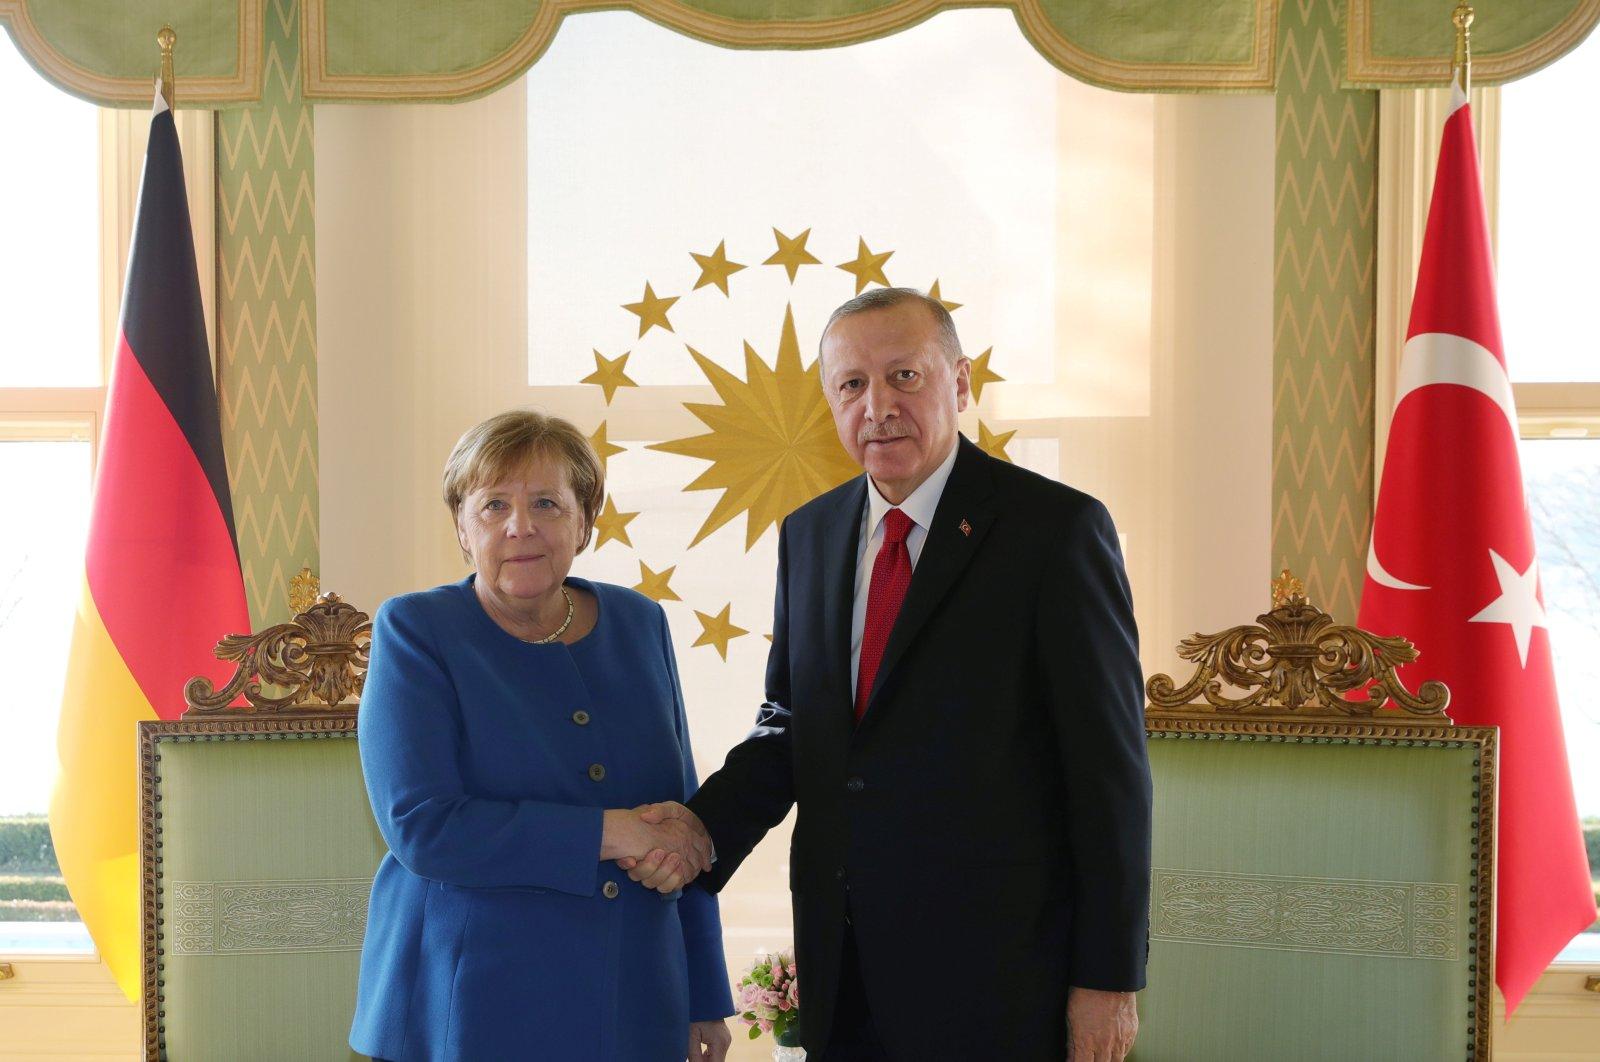 President Recep Tayyip Erdoğan shakes hands with German Chancellor Angela Merkel in Istanbul, Jan. 24, 2020. (Reuters Photo)